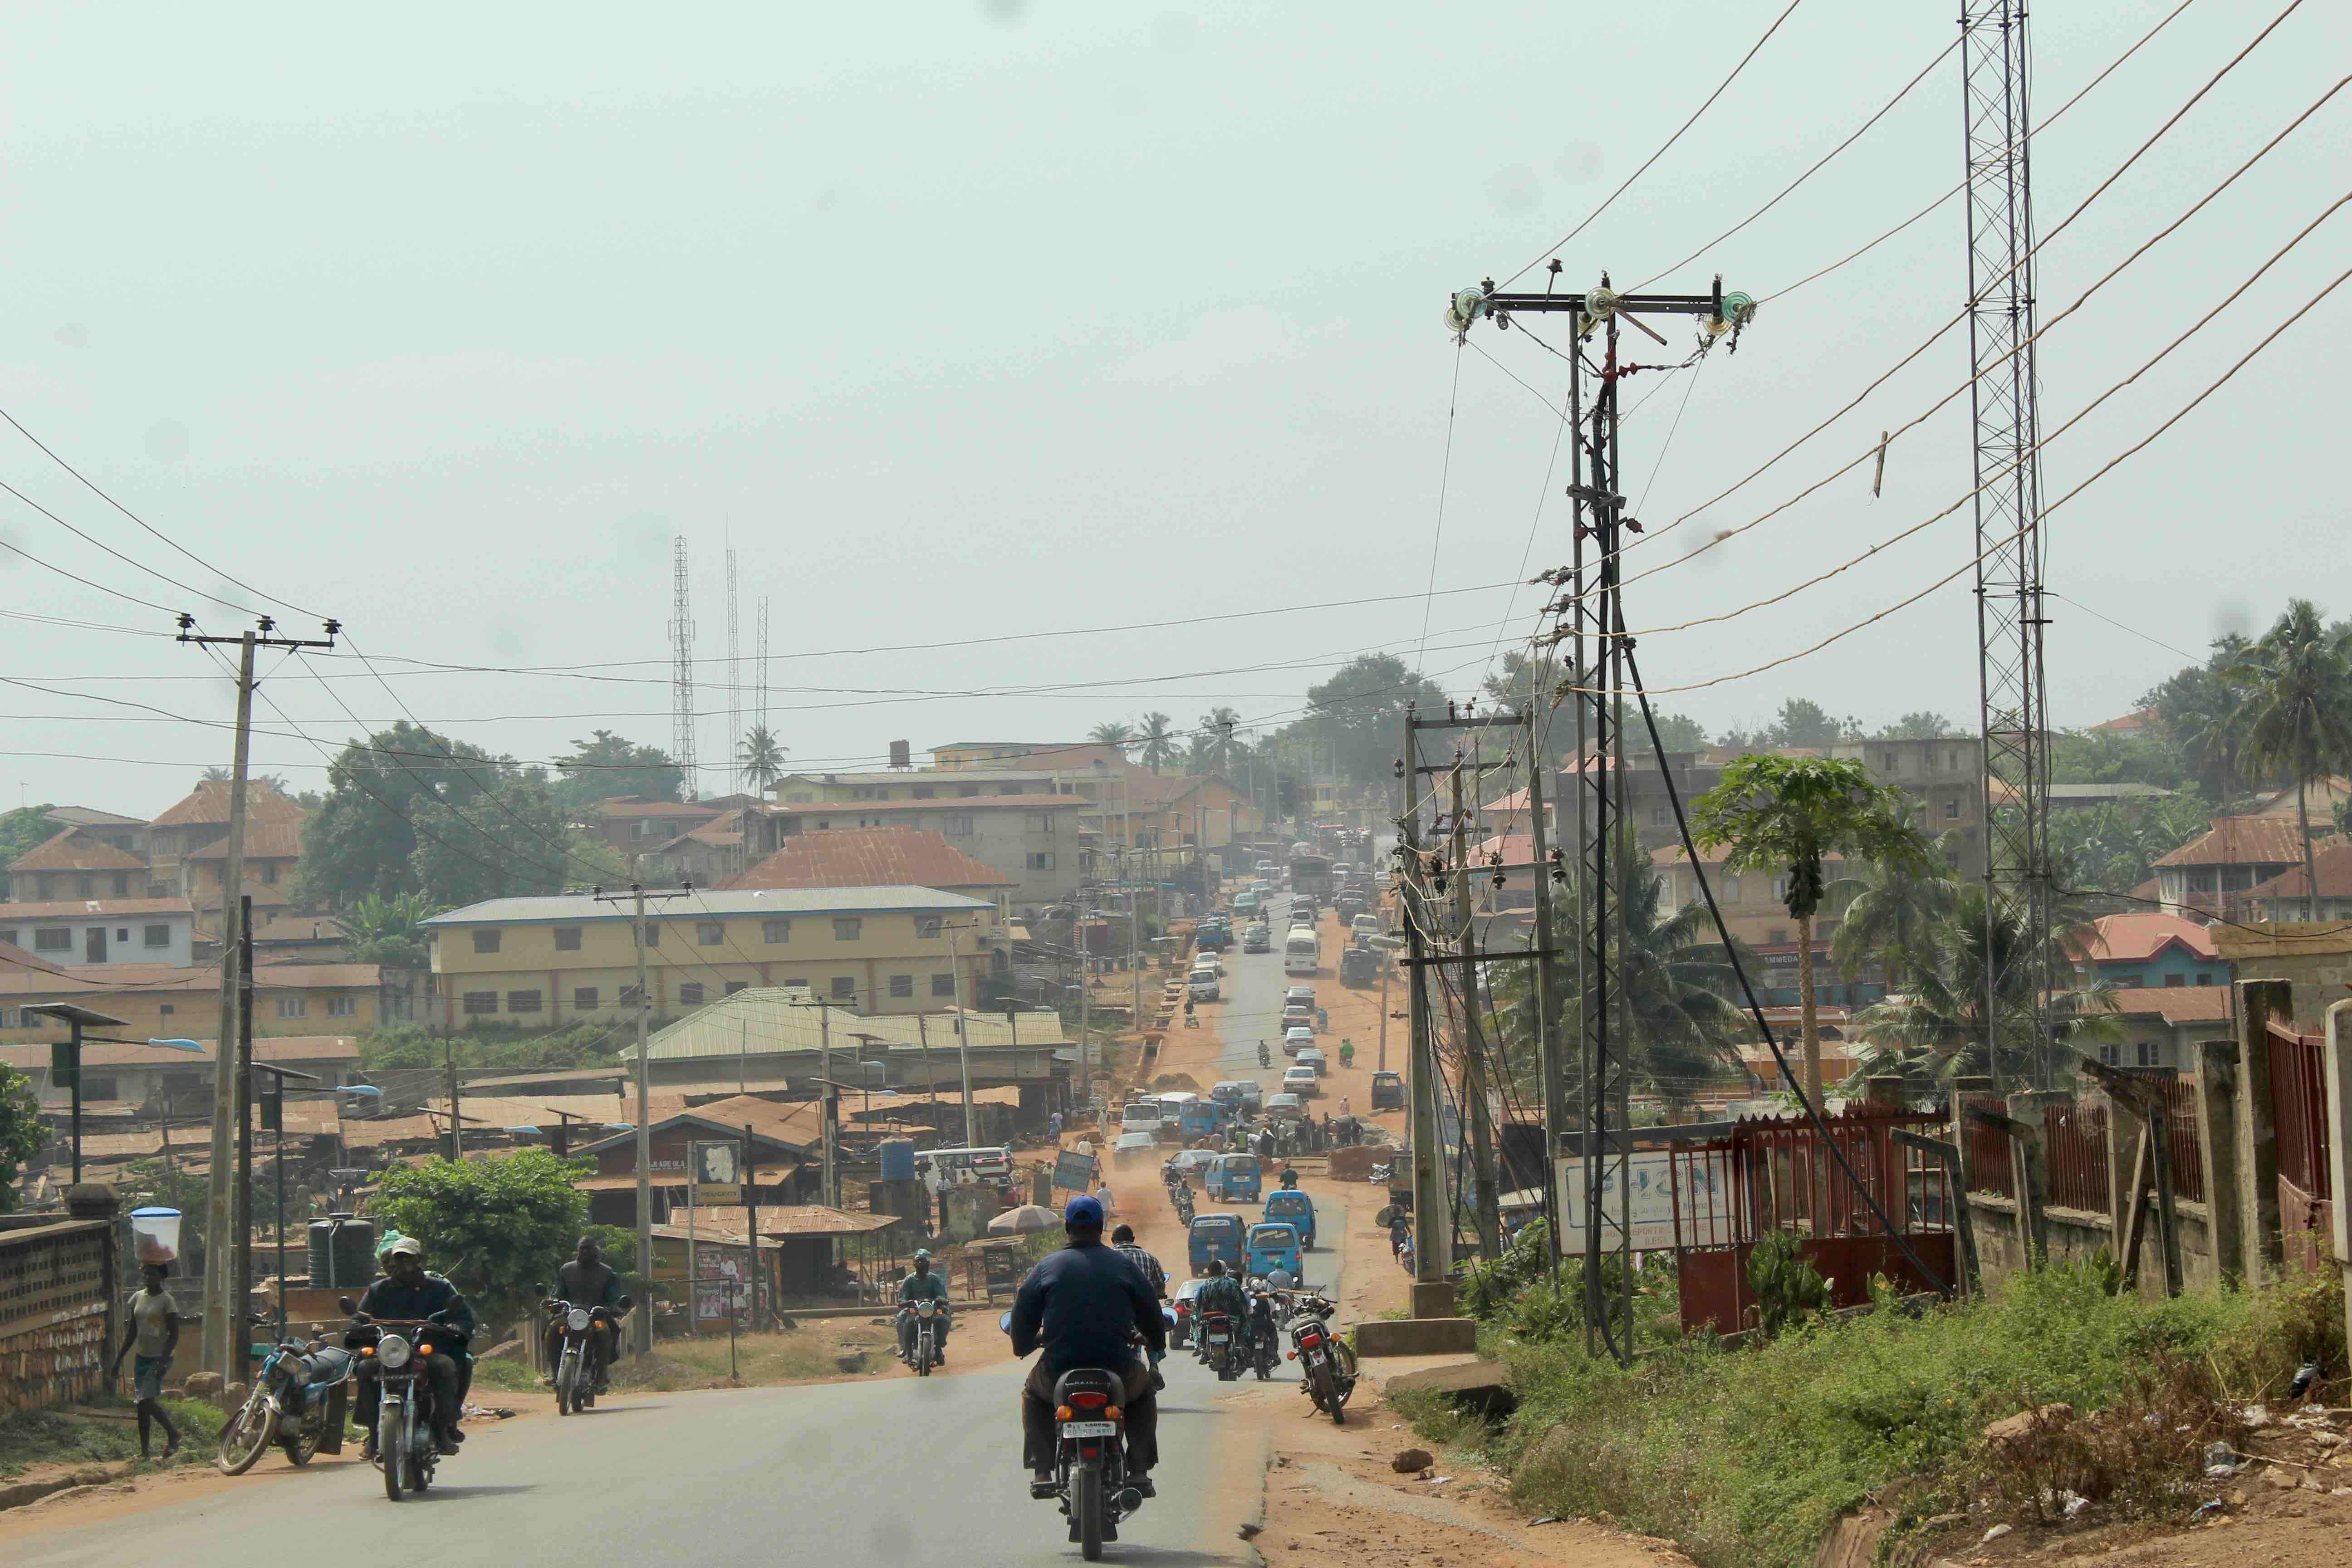 Ilesa-Oshogbo Road, Ilesa, Osun State, Nigeria. #JujuFilms